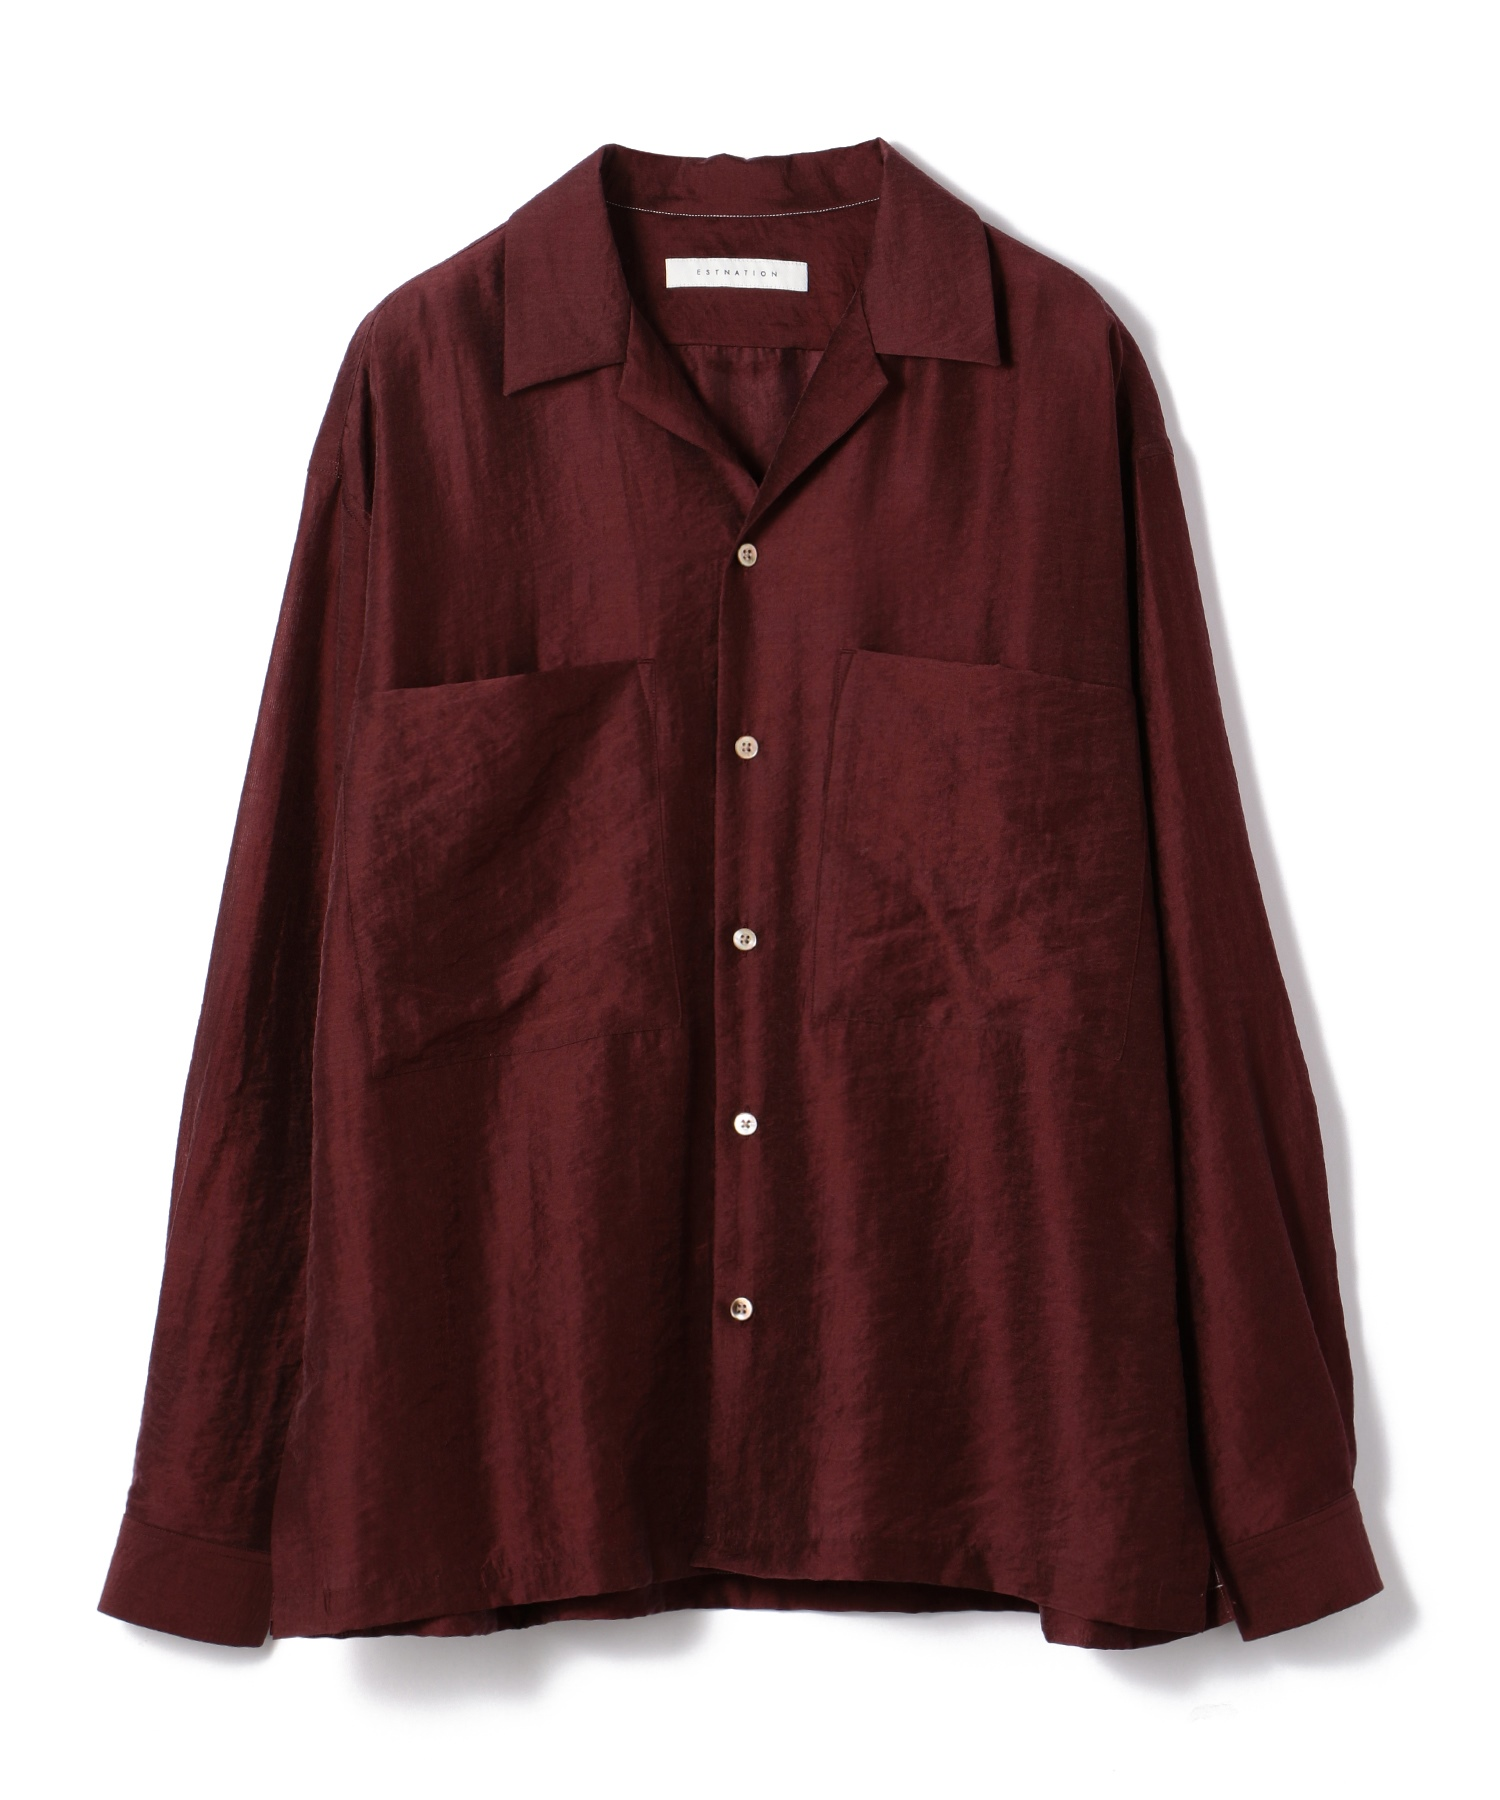 ESTNATION / オープンカラーロングスリーブシャツ